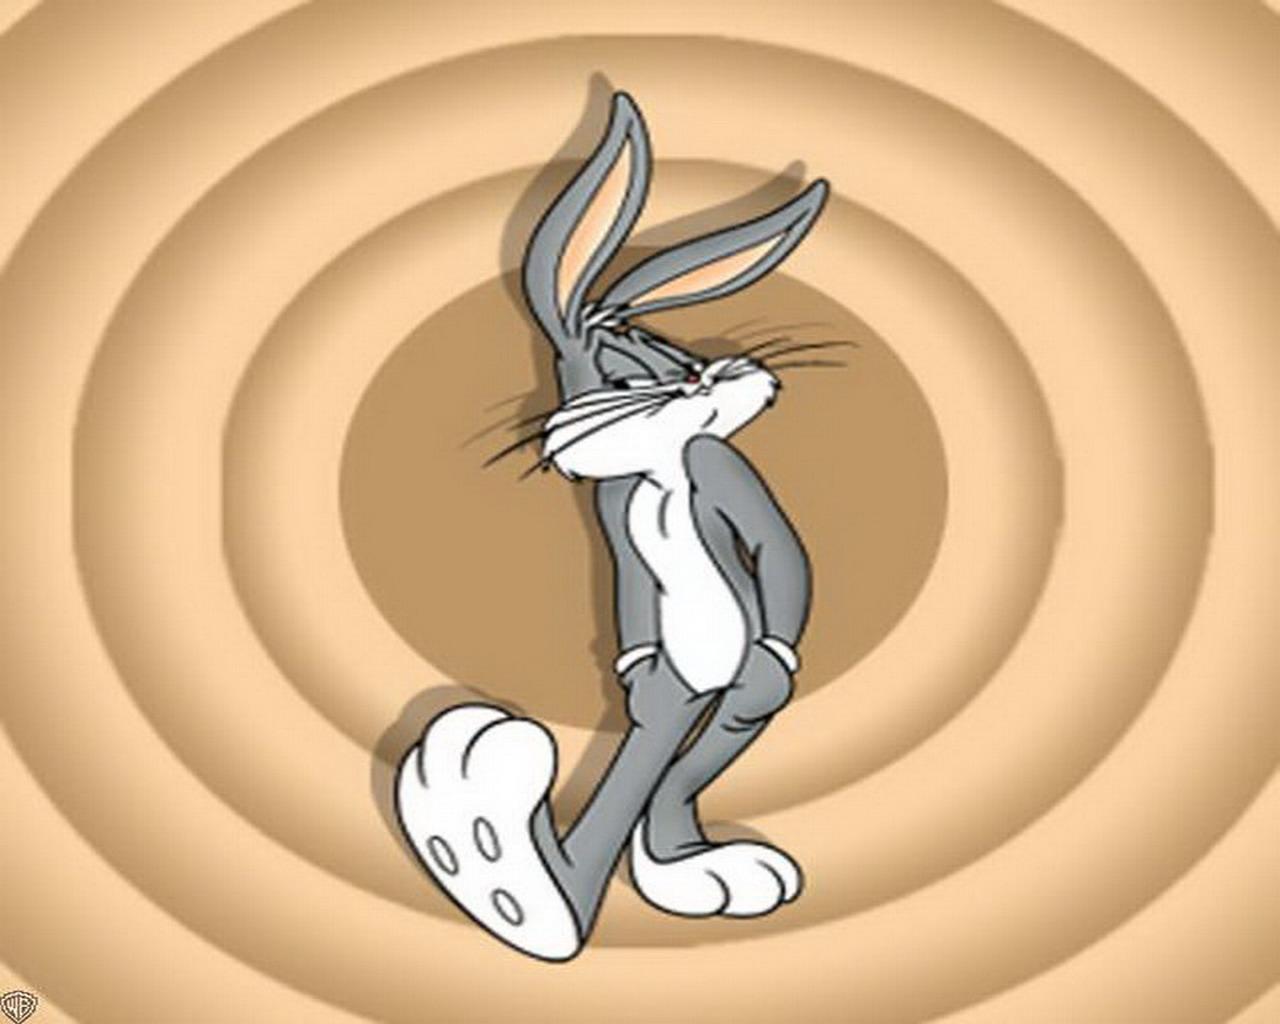 http://3.bp.blogspot.com/-94dfenyLBrI/TlPmNW4AuZI/AAAAAAAAAgM/9eftLtbepqQ/s1600/Bugs-Bunny-6.jpg